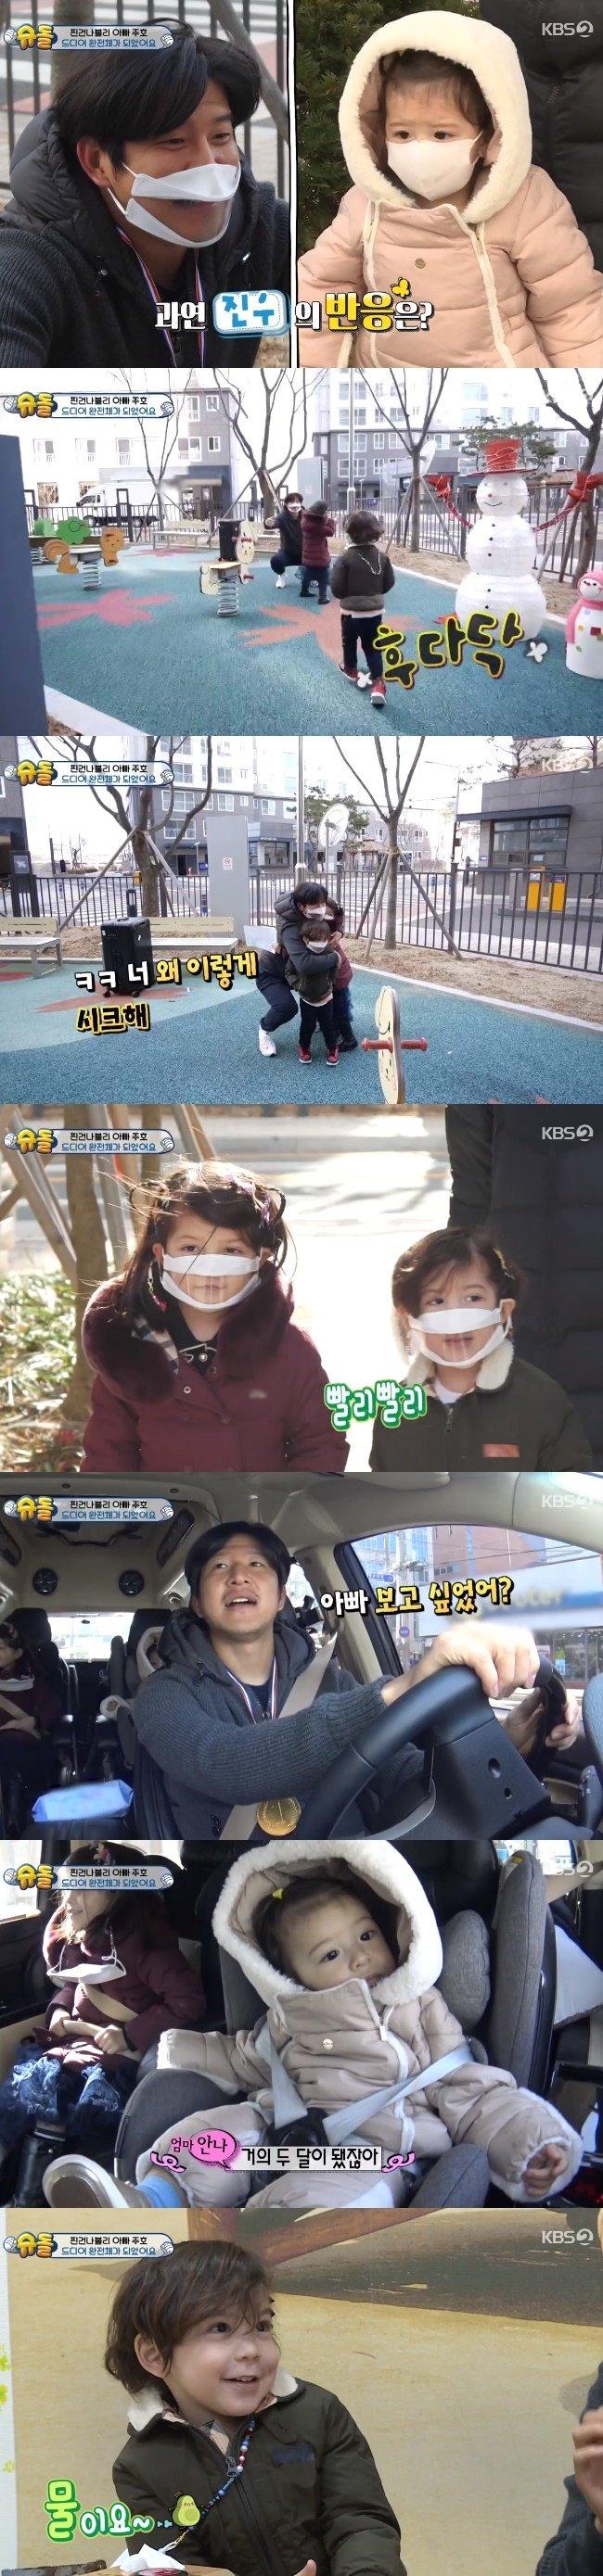 KBS 캡처 © 뉴스1